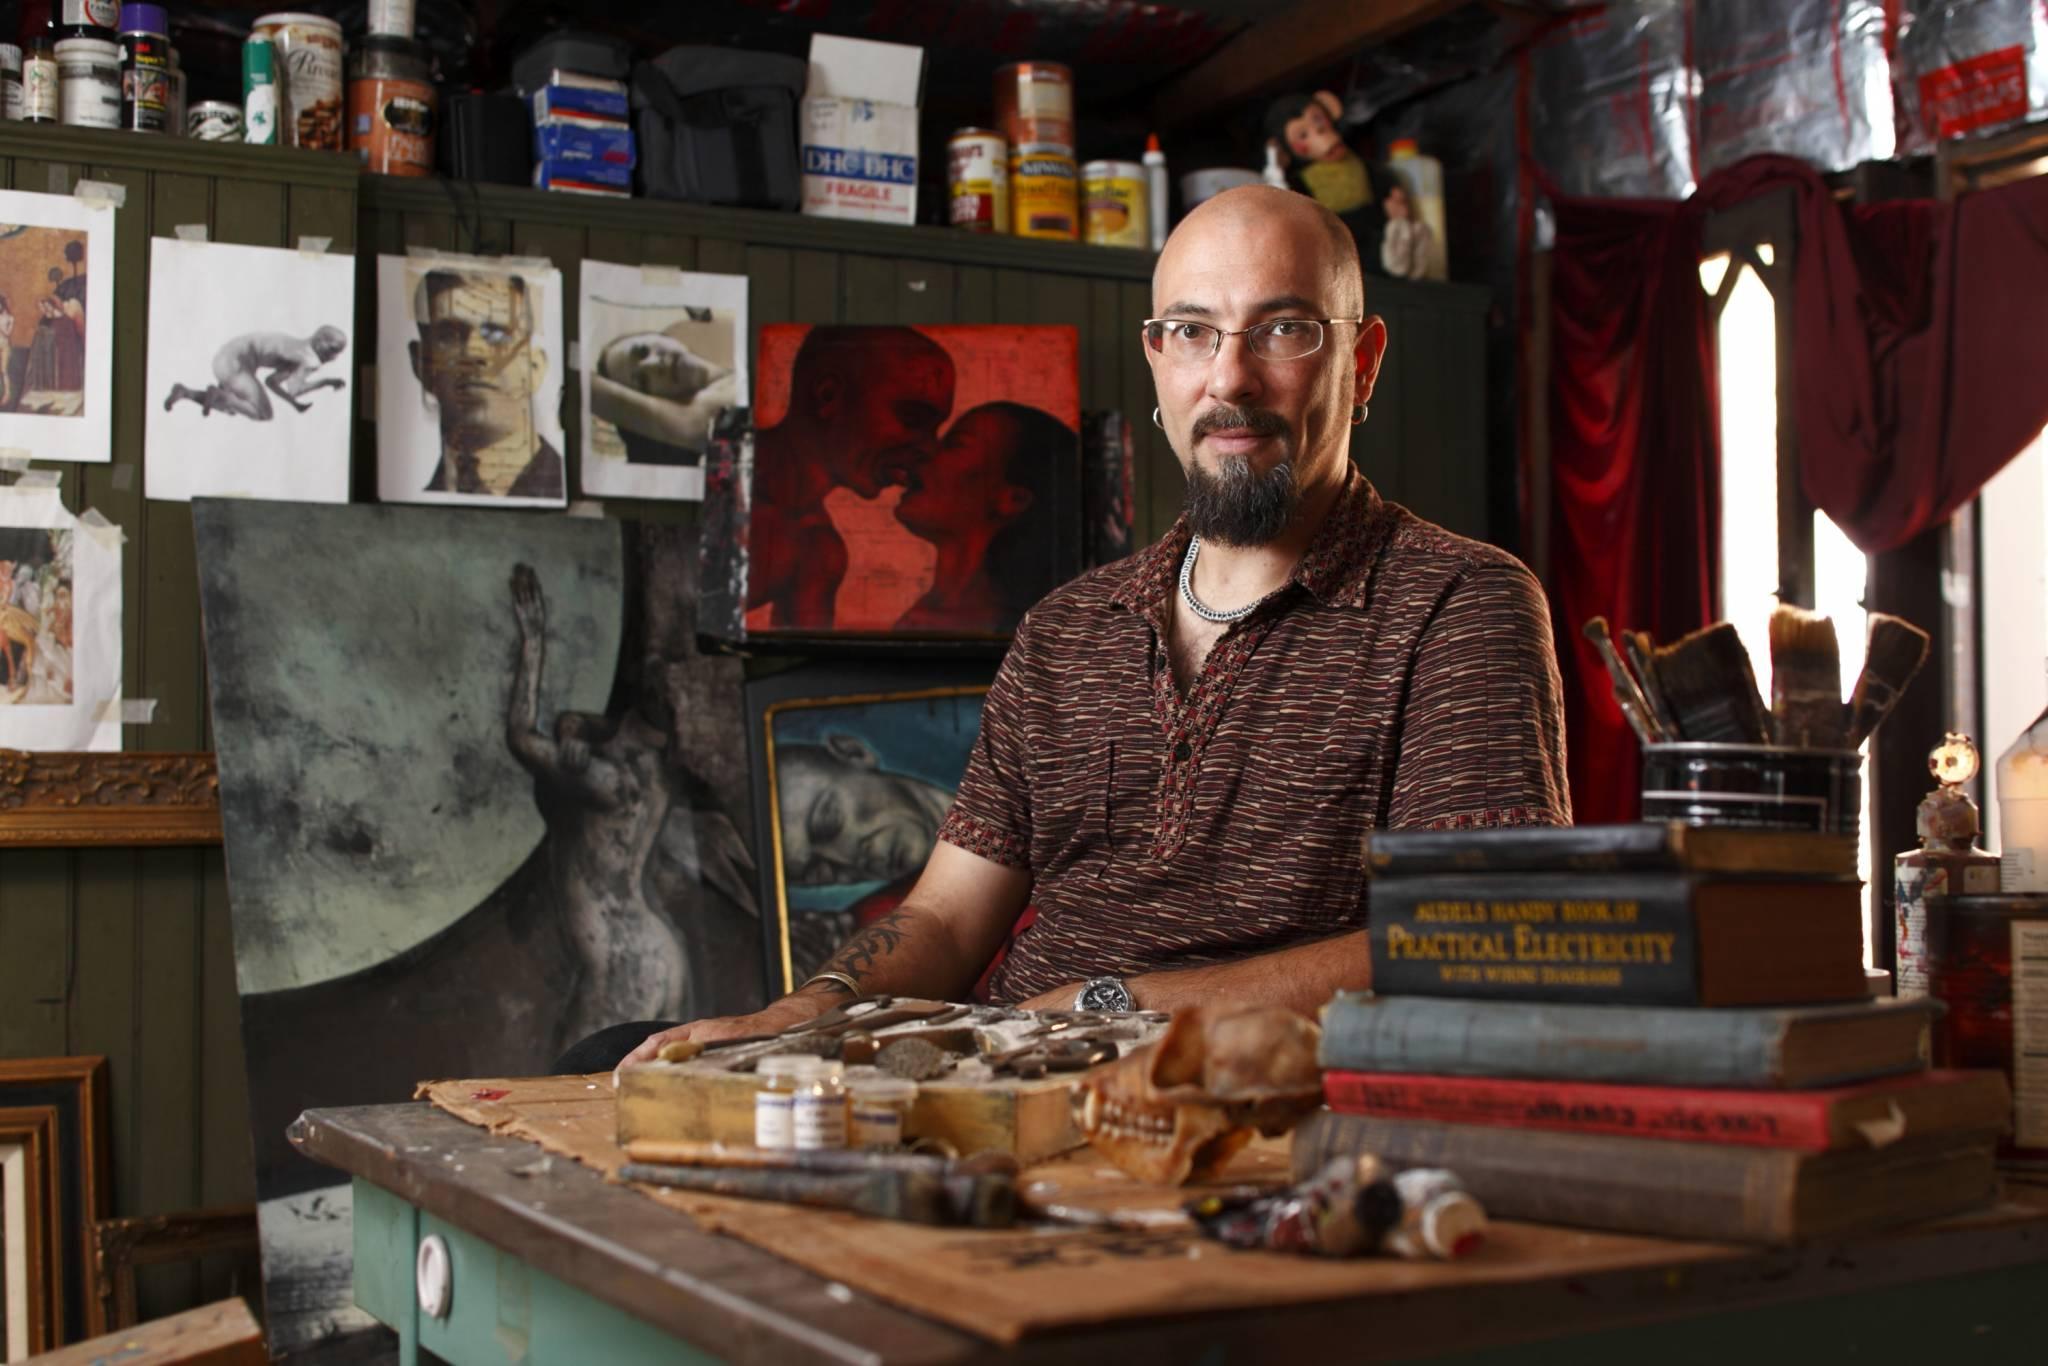 Environmental Portrait Of The Artist Craig Larotunda